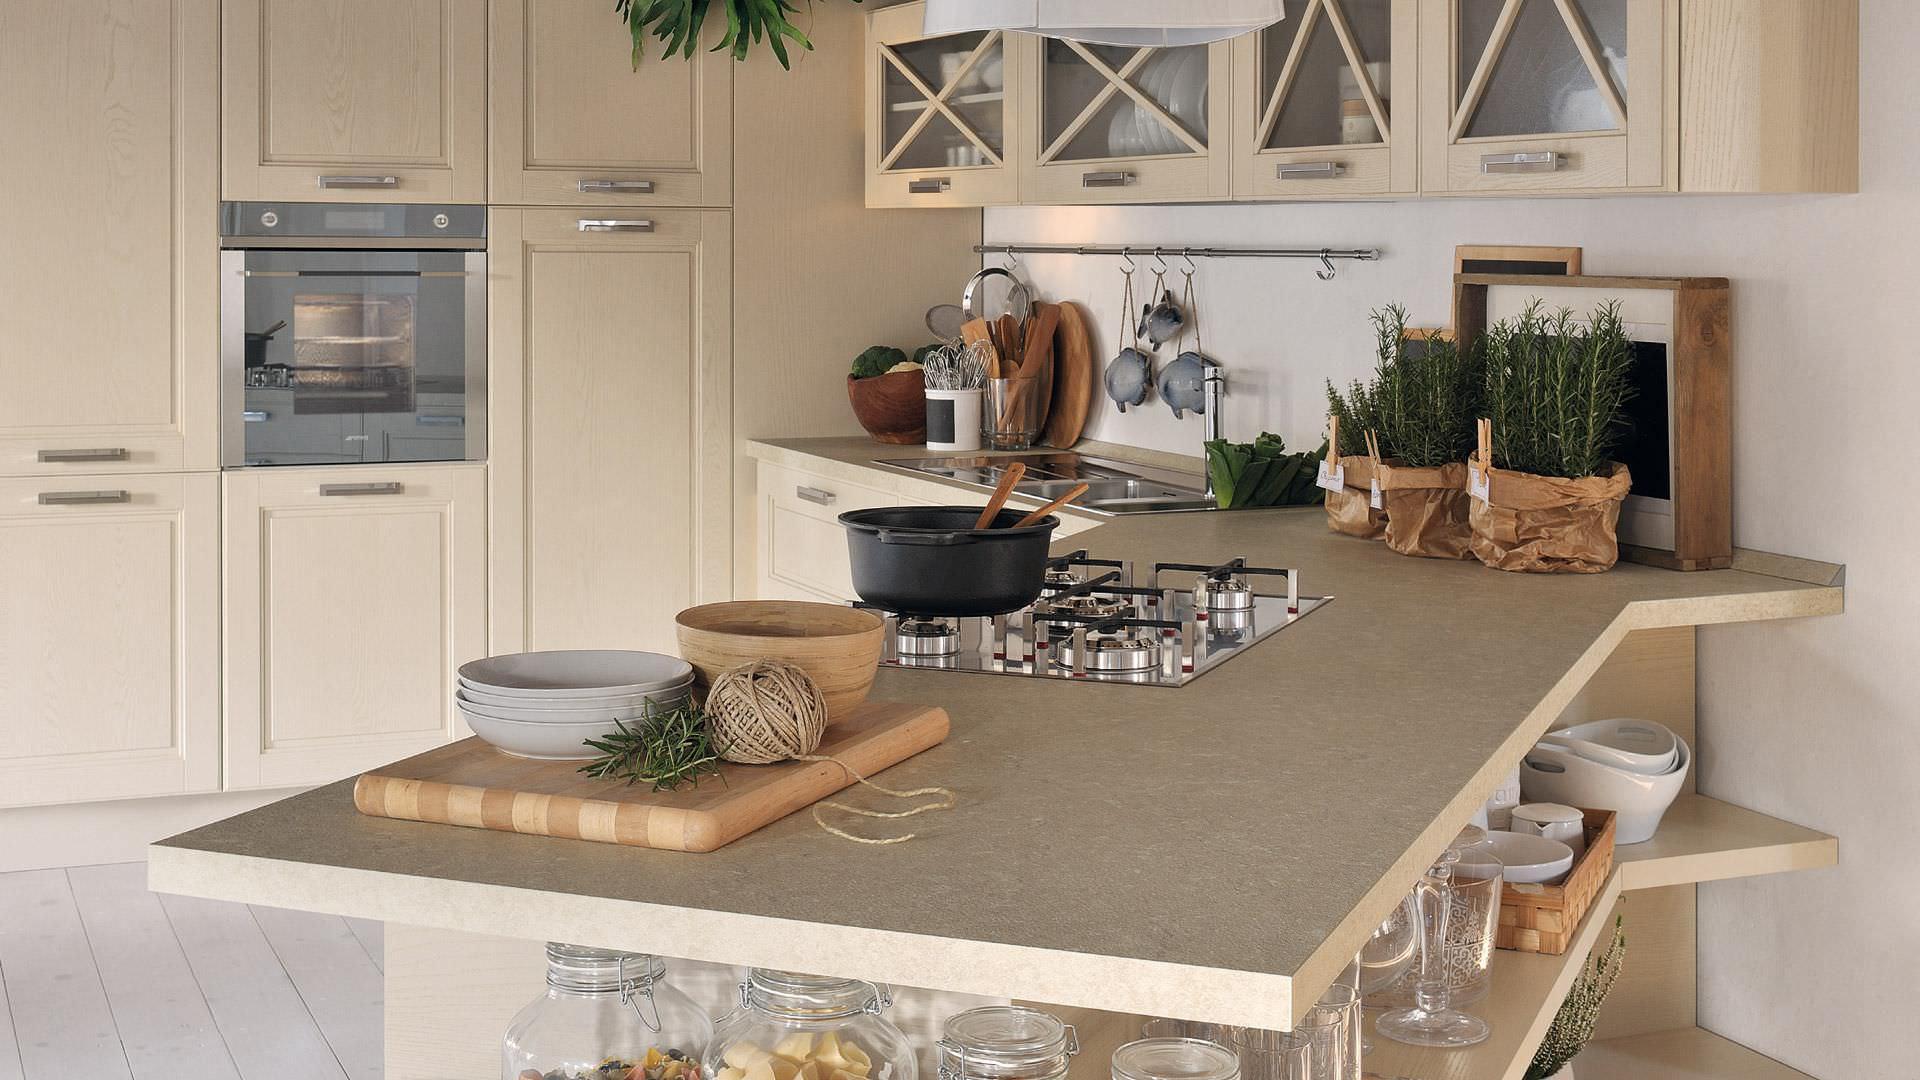 Cucina classica / in legno massiccio / con impugnature - AGNESE ...